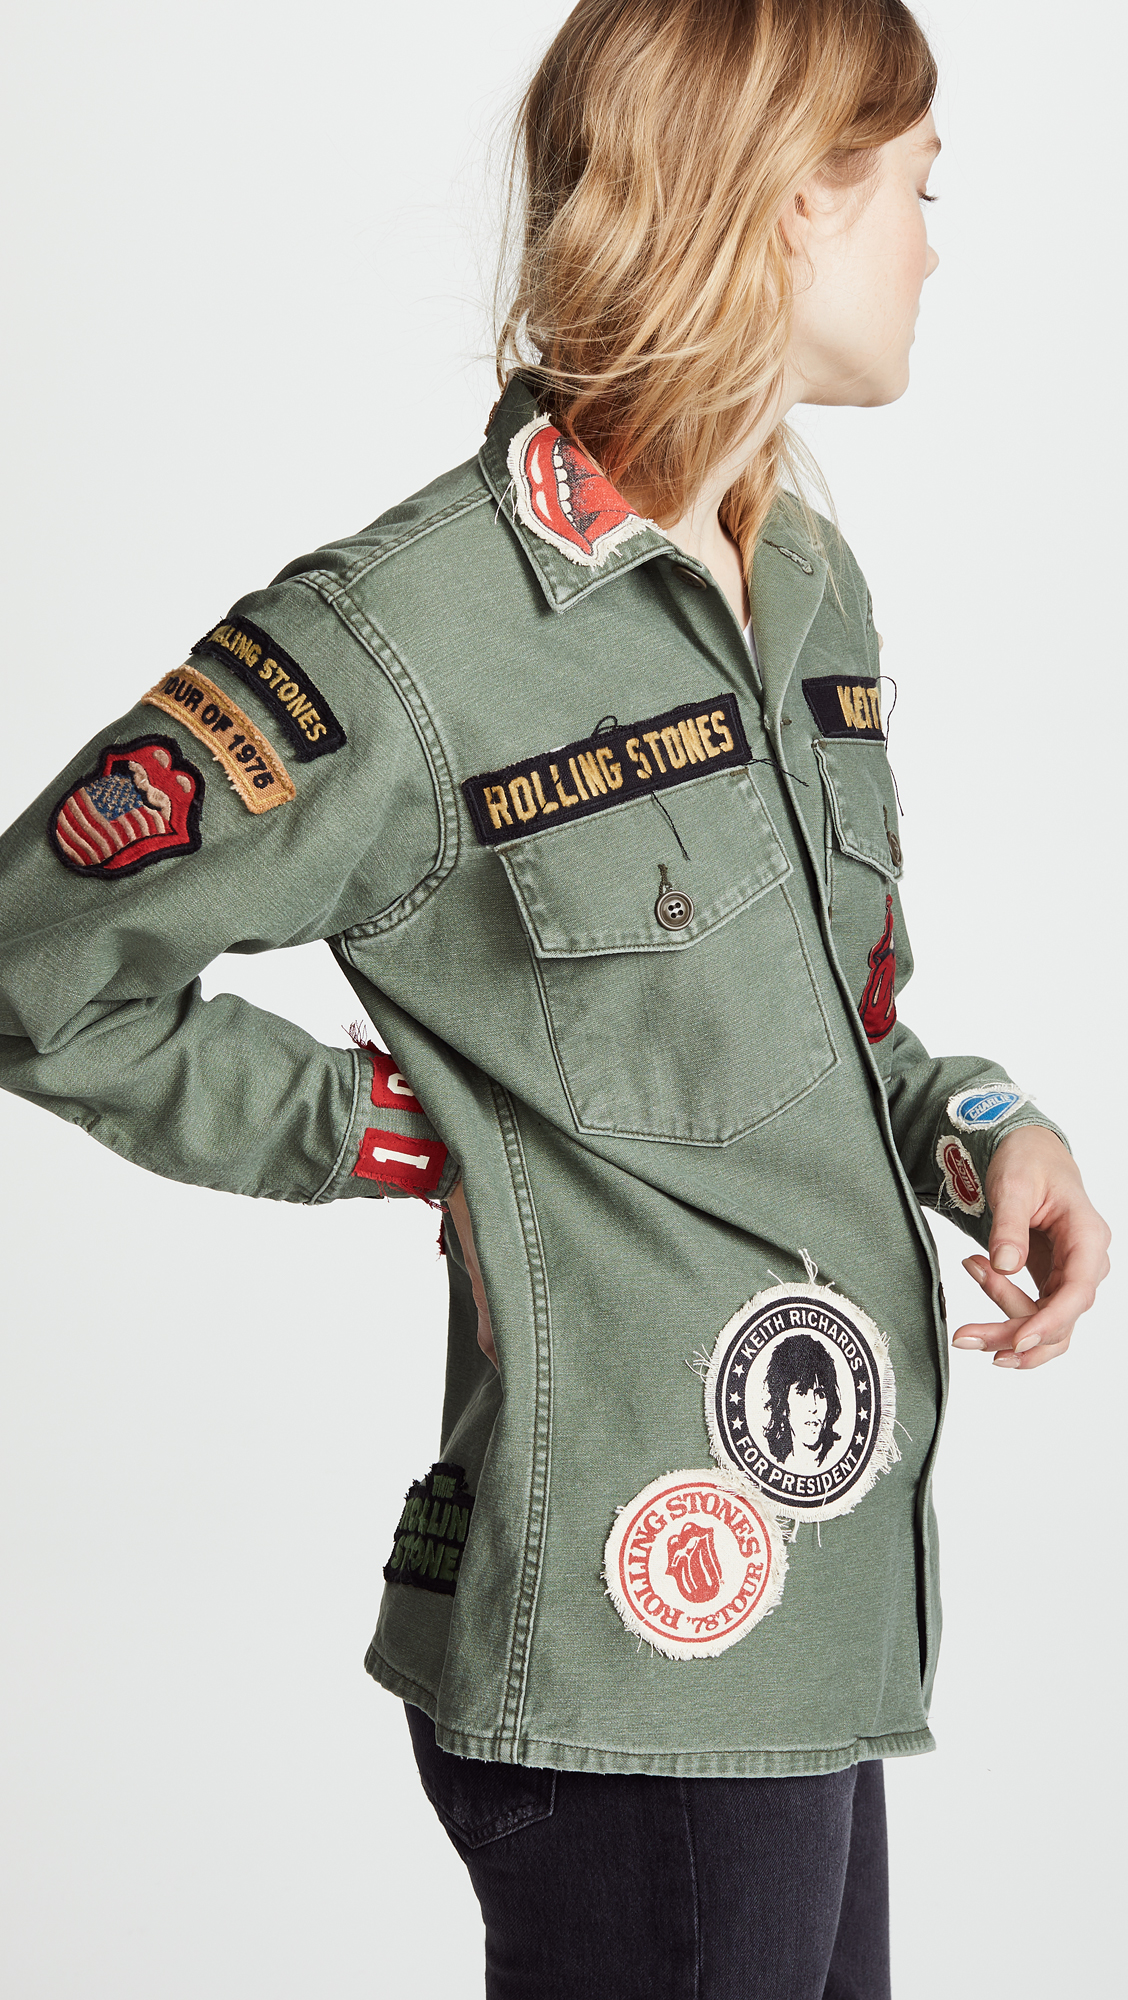 e9aa544f81634 MADEWORN ROCK Rolling Stones 1975 Army Jacket | SHOPBOP